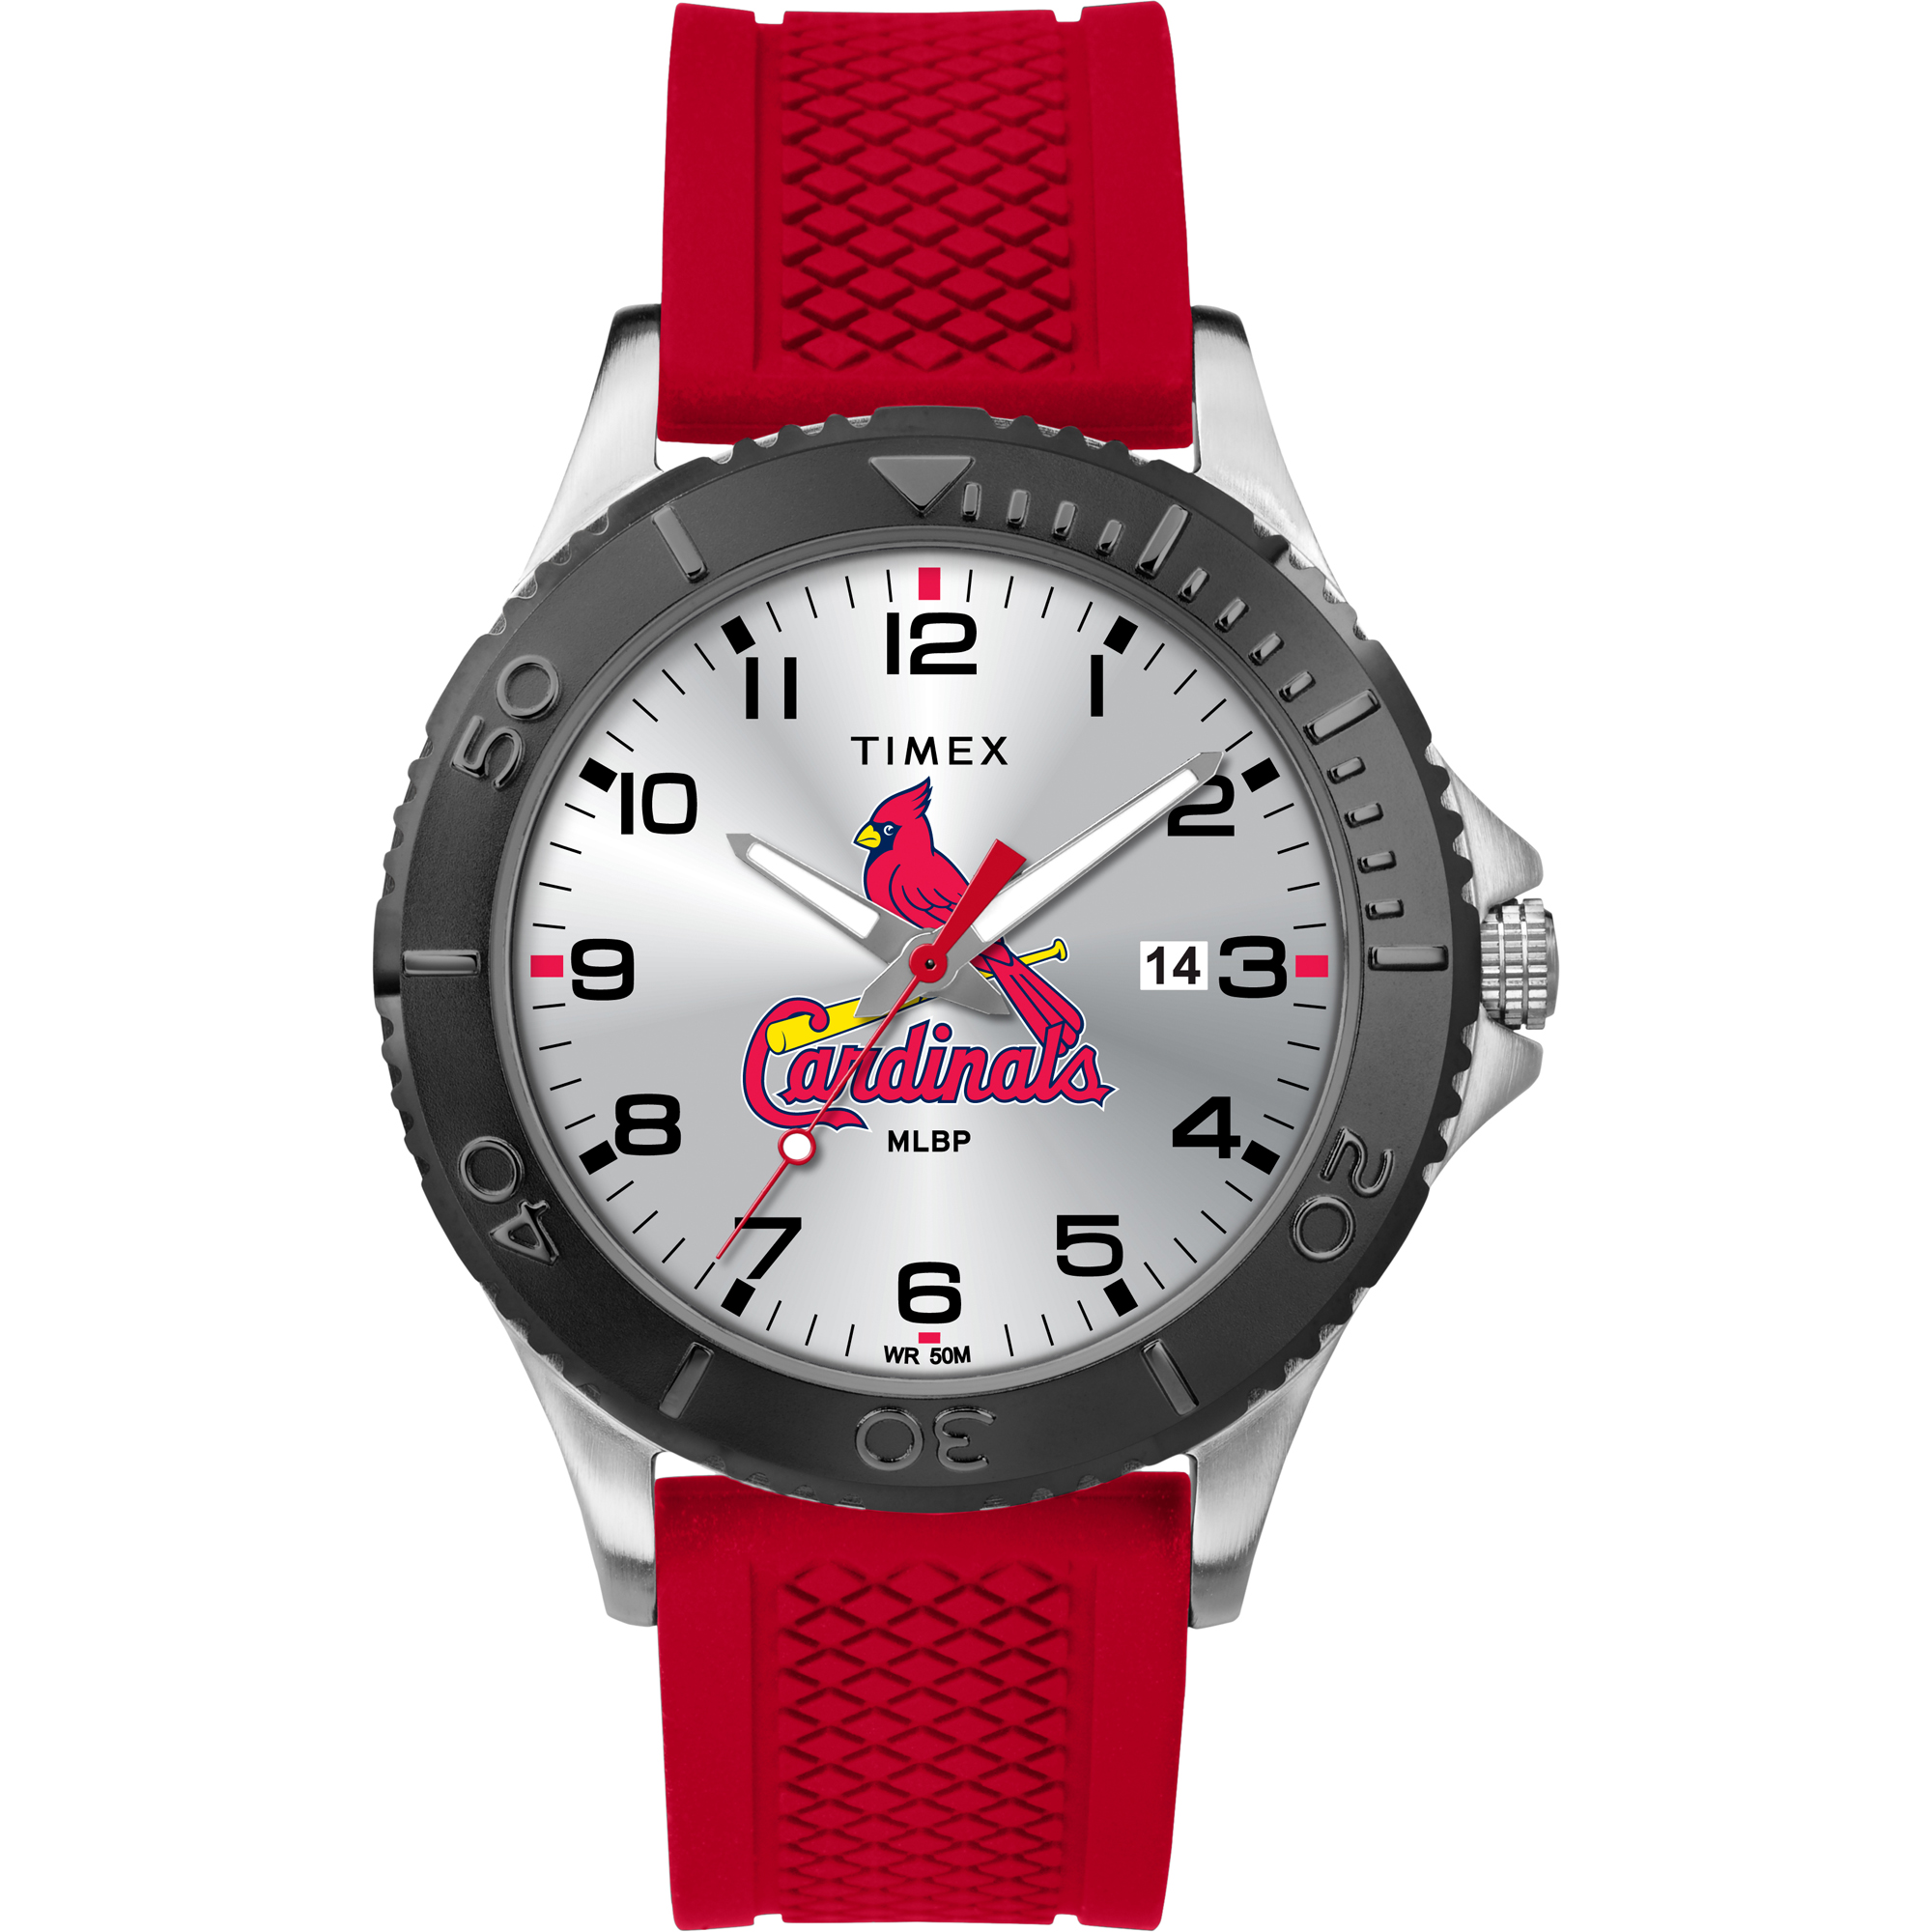 St. Louis Cardinals Timex Gamer Watch - No Size